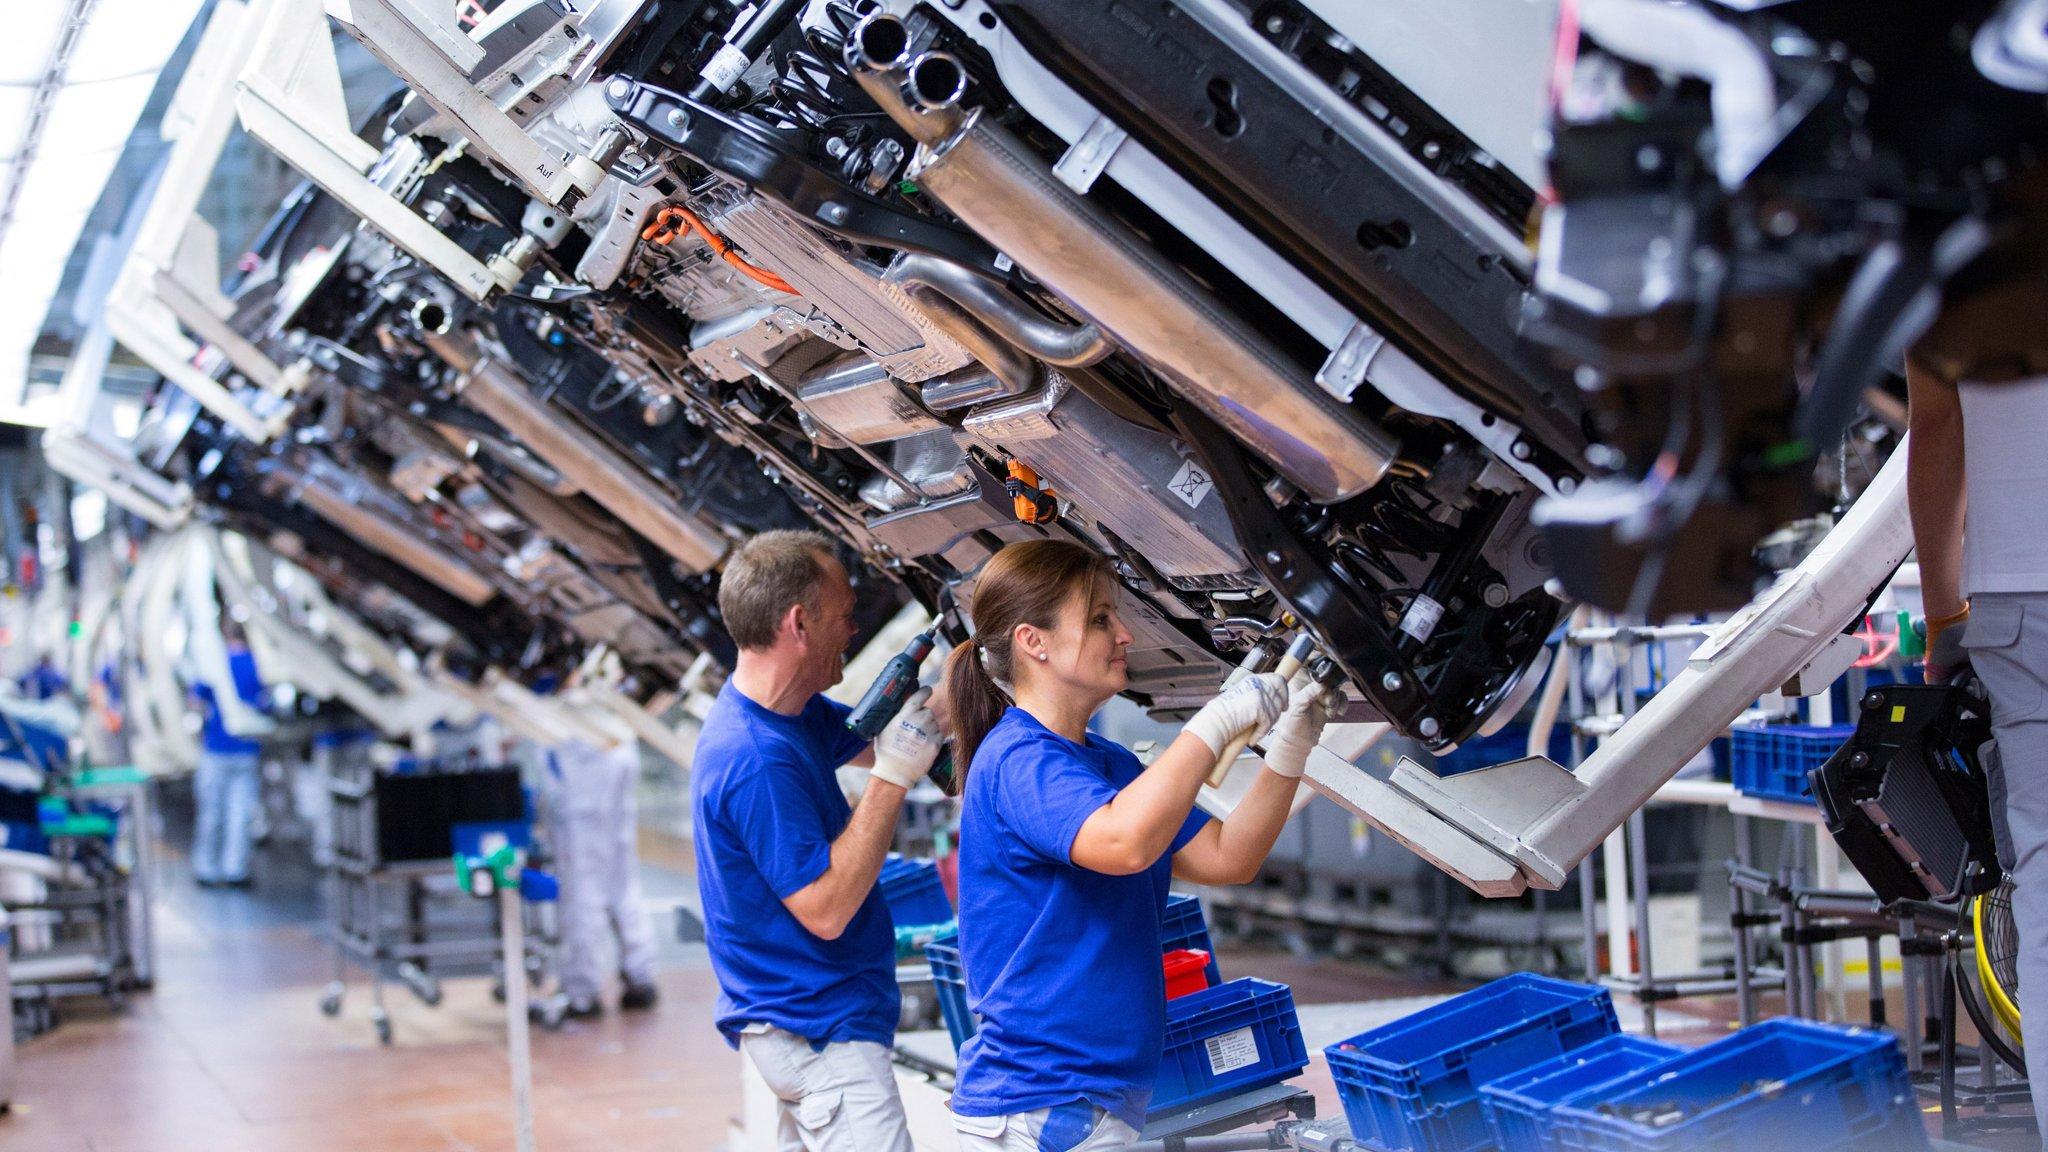 Business data reinforce eurozone's economic strength